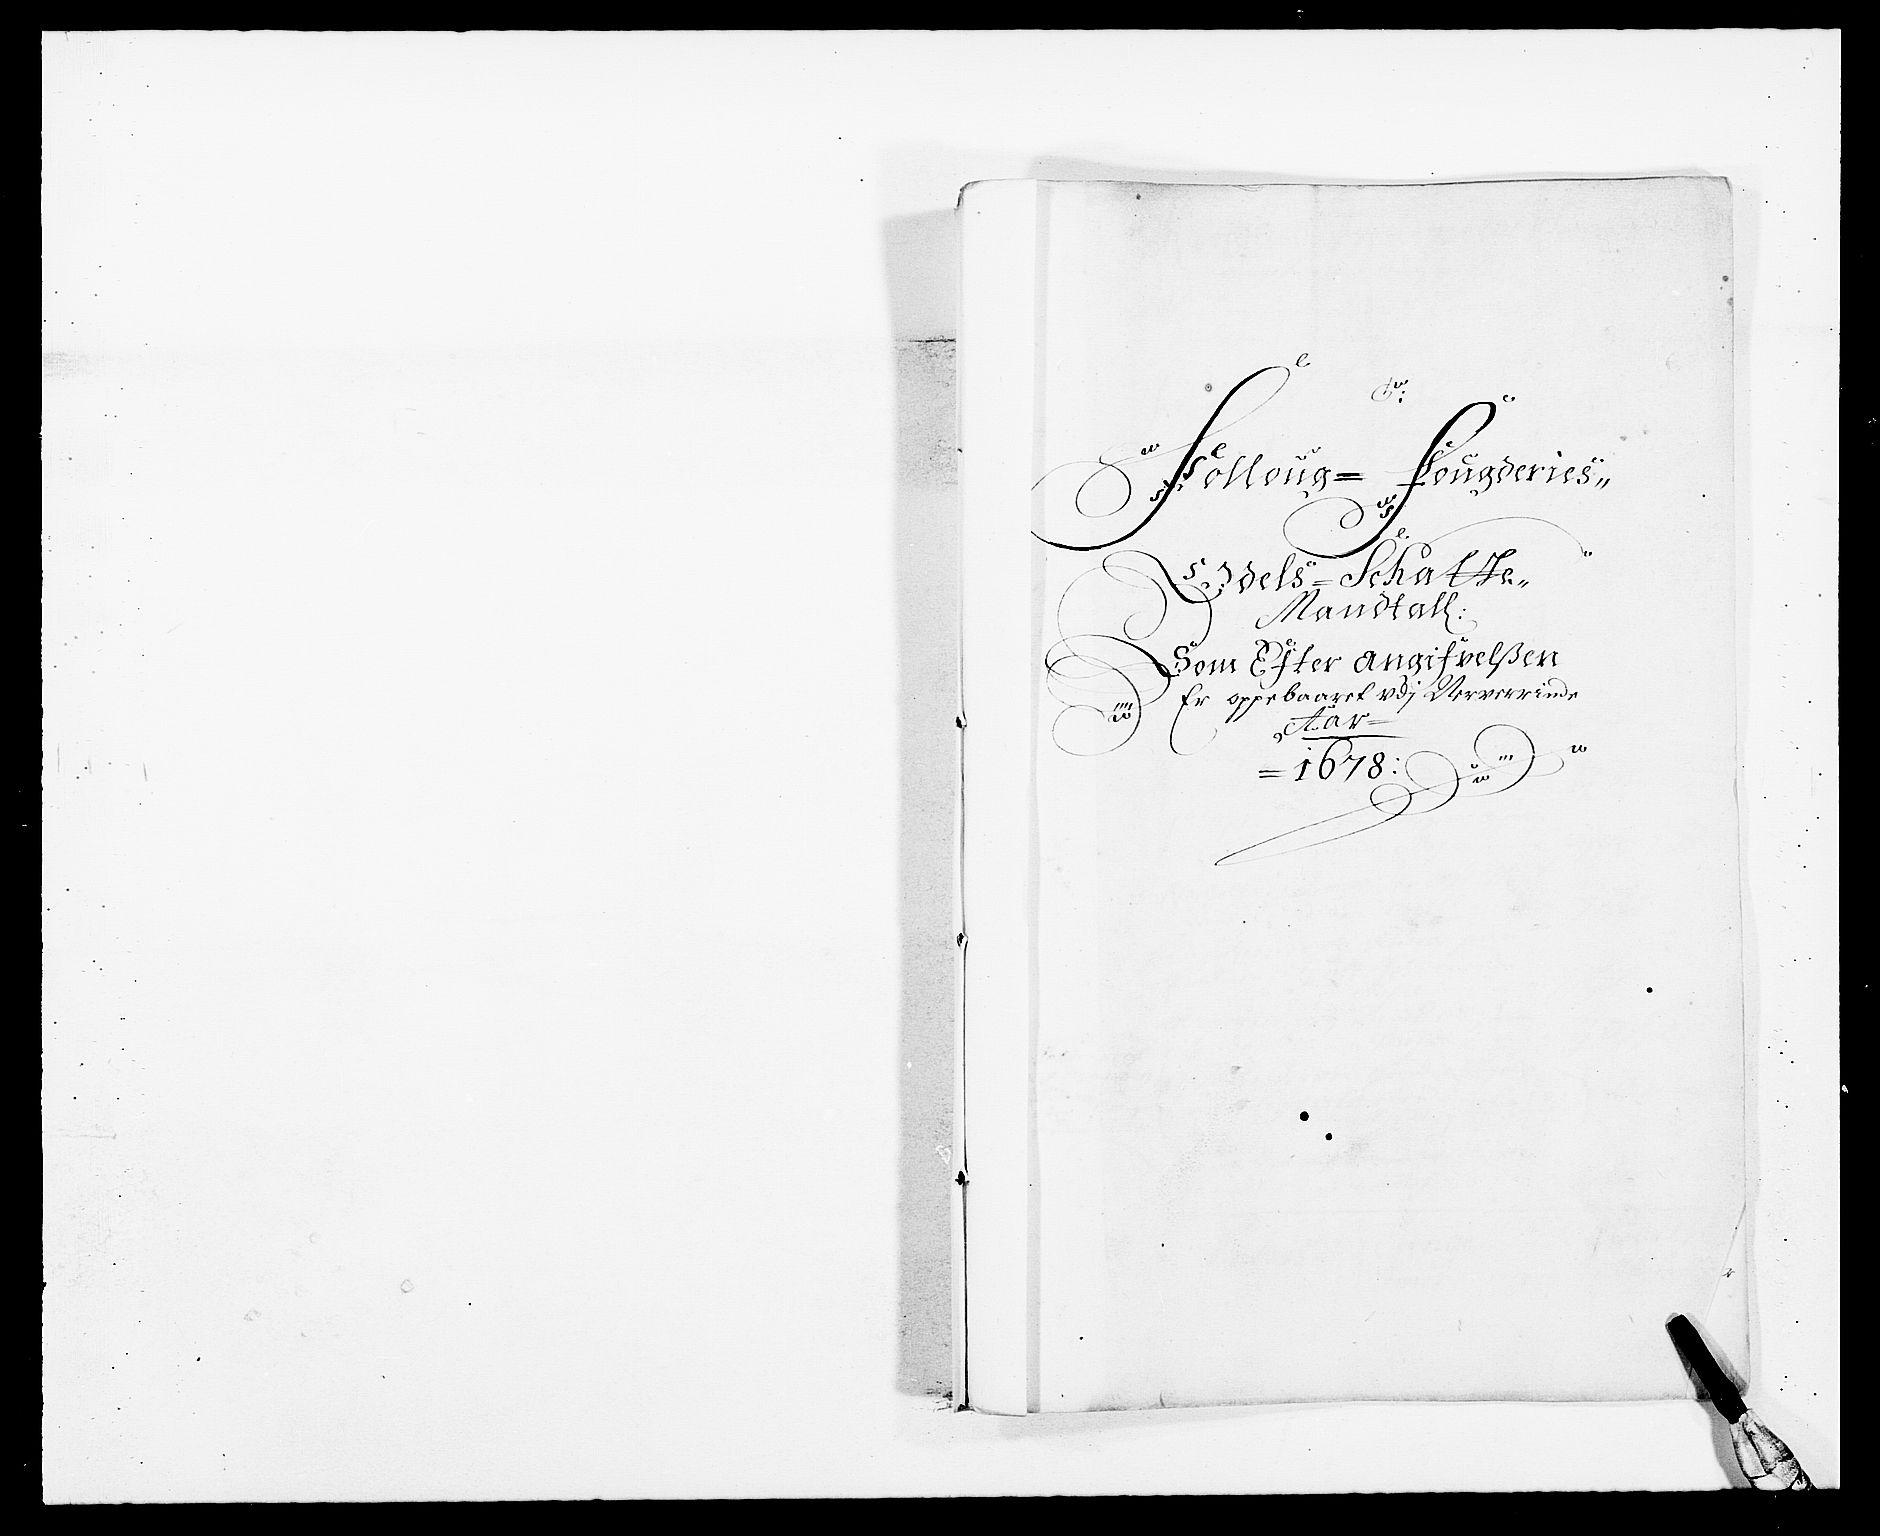 RA, Rentekammeret inntil 1814, Reviderte regnskaper, Fogderegnskap, R09/L0427: Fogderegnskap Follo, 1678, s. 141